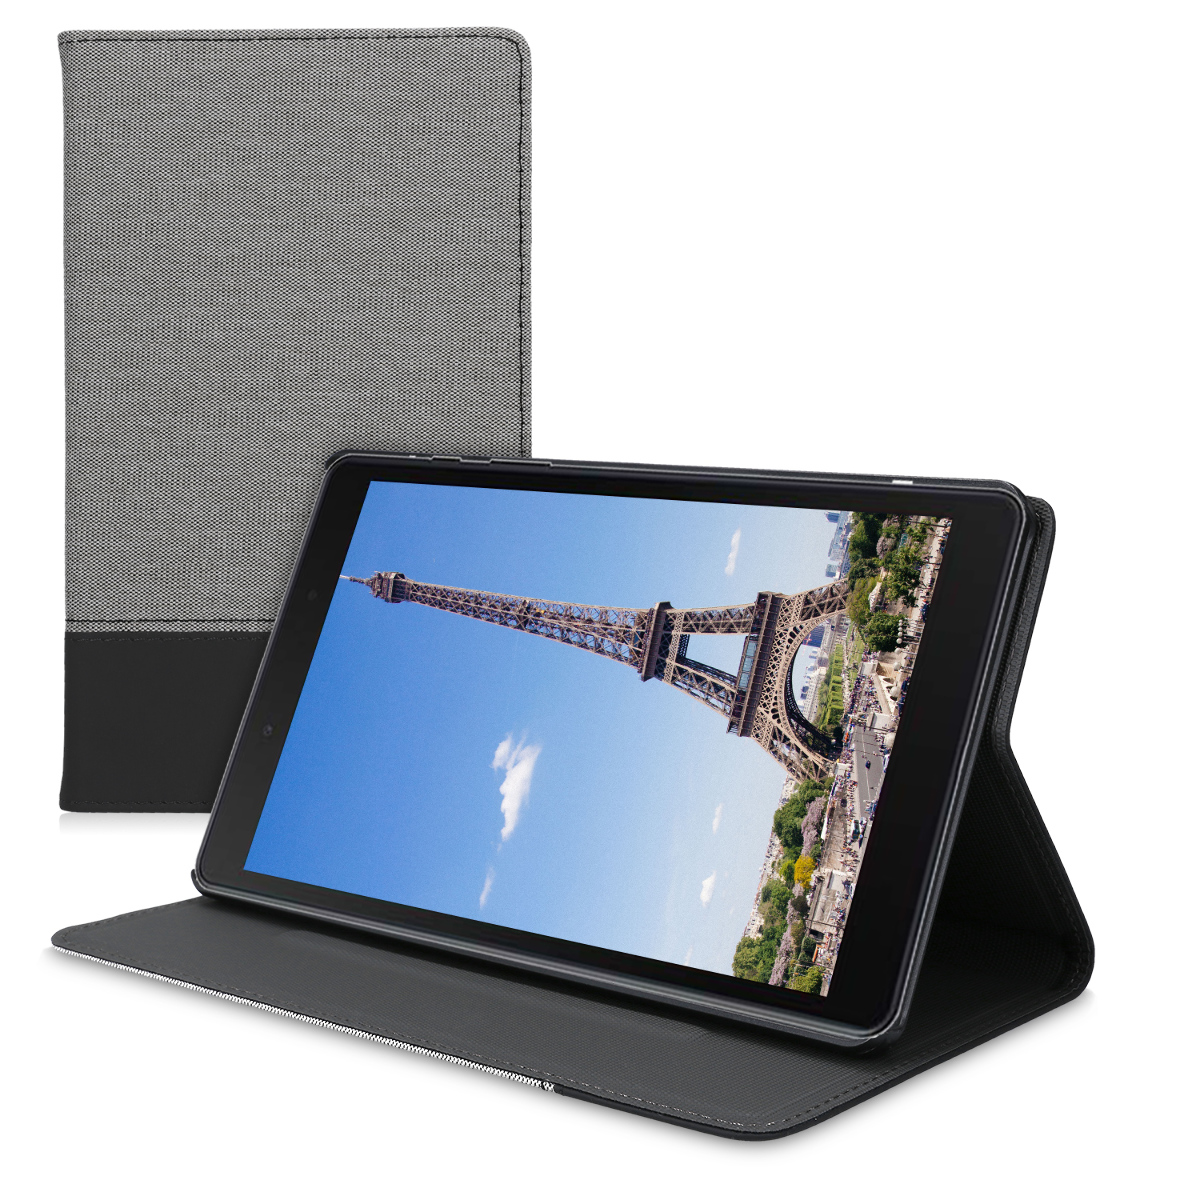 KW Θήκη Samsung Galaxy Tab A 8.0 2019 - PU Leather and Canvas Protective Cover - Grey / Black (51057.01)